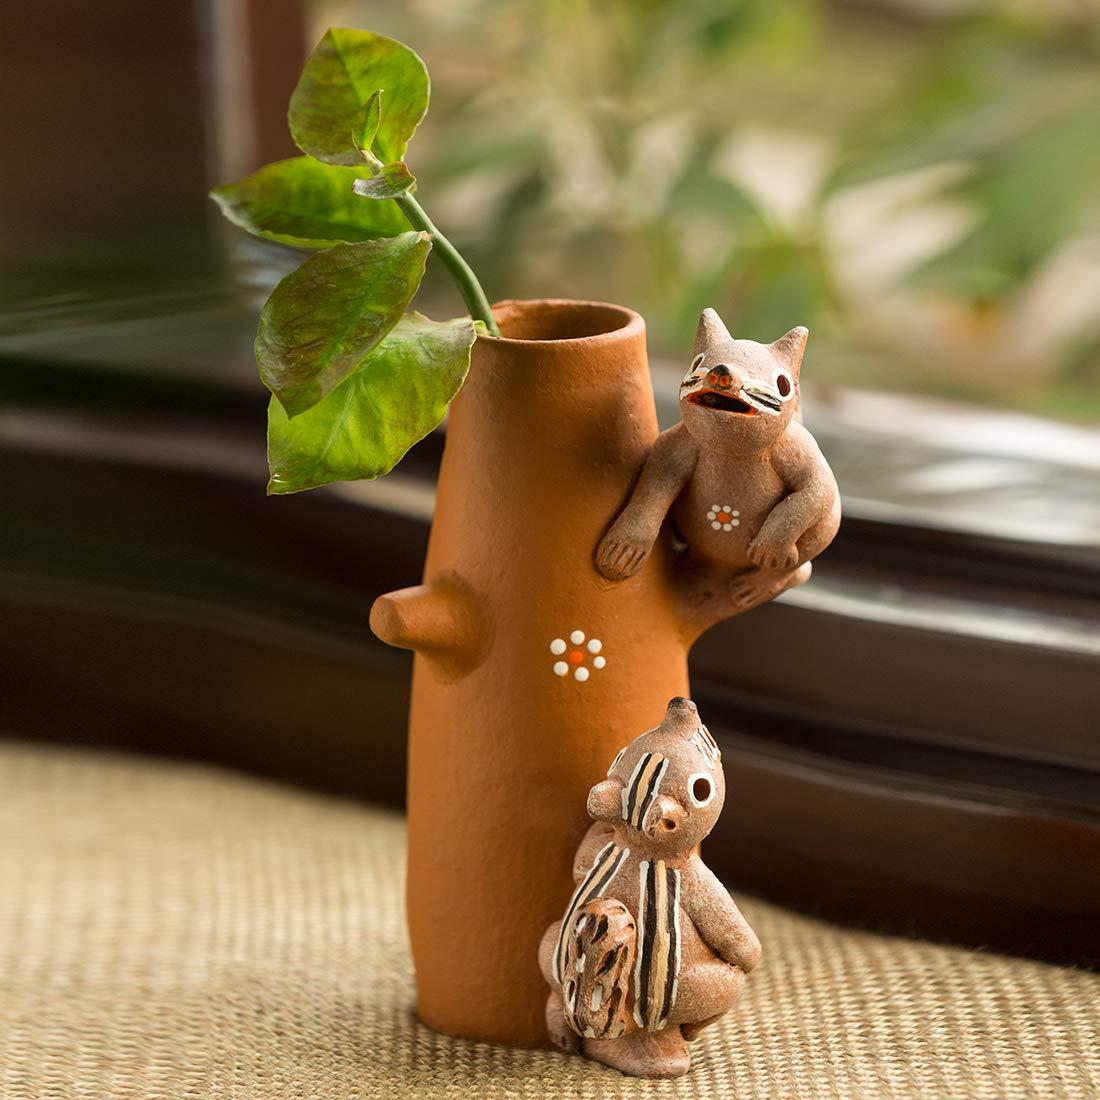 'Climbing Squirrels' Decorative Handmade Terracotta Flower Vase